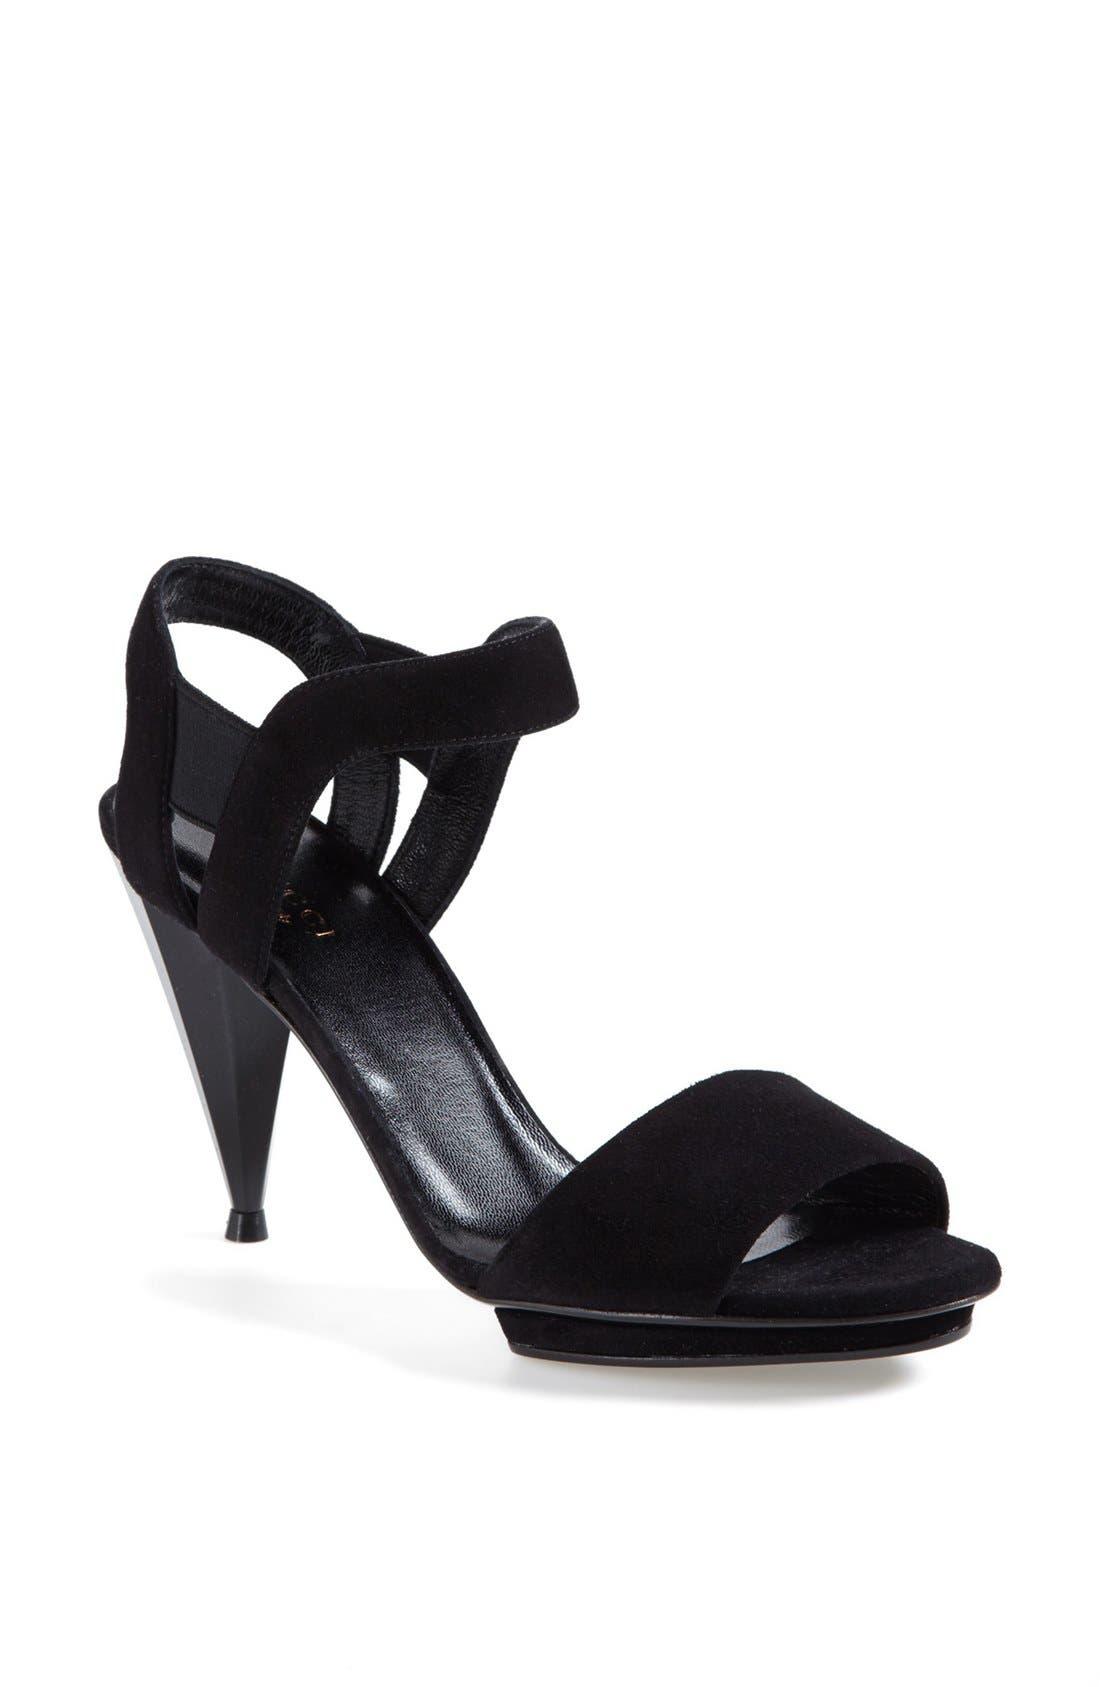 Alternate Image 1 Selected - Gucci 'Liberty' Sandal